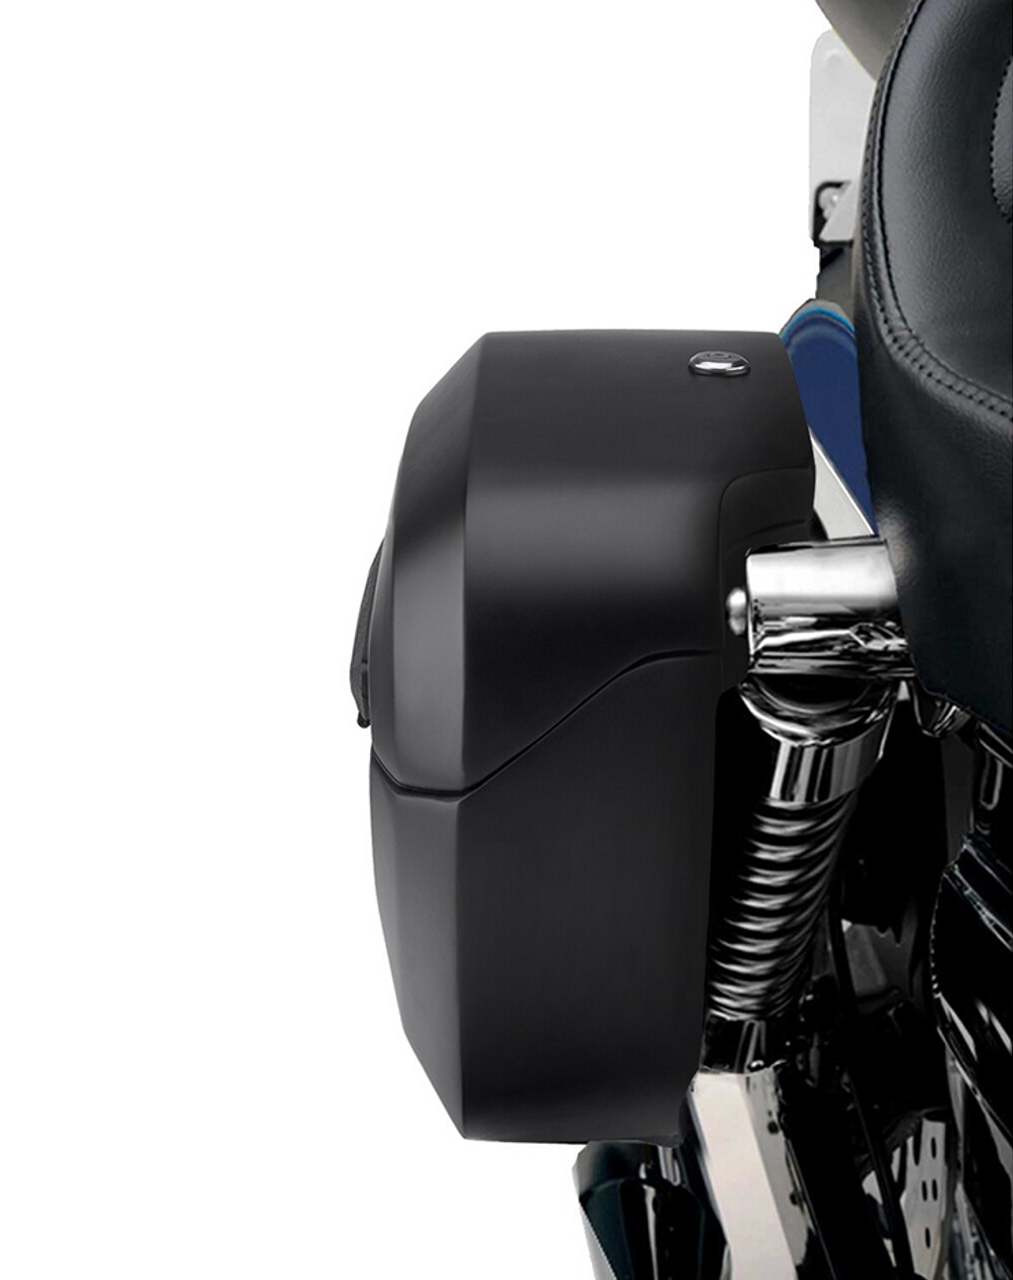 Viking Lamellar Shock Cutout Large Matte Motorcycle Hard Saddlebags For Yamaha V Star 950 Classic Shock Cutout View